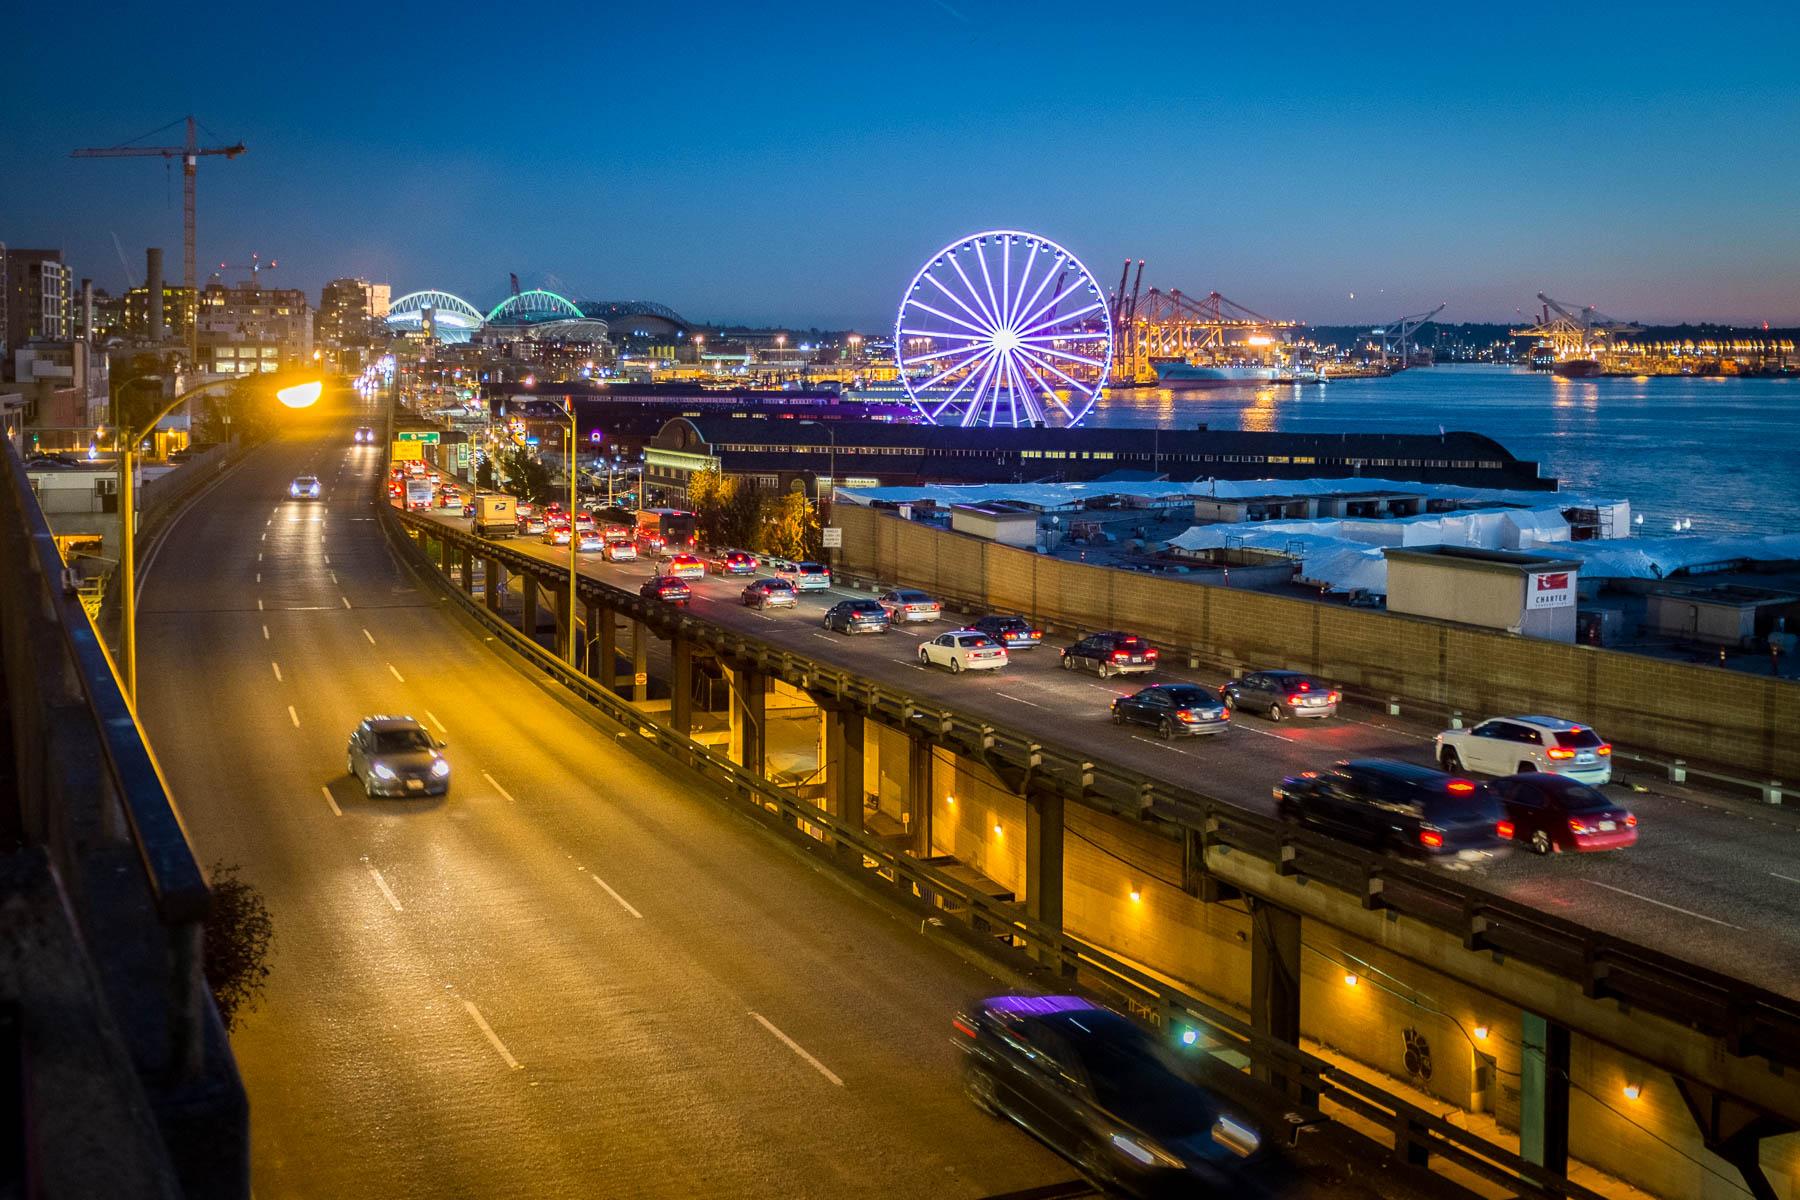 Seattle Fall 2015 (11 of 54)